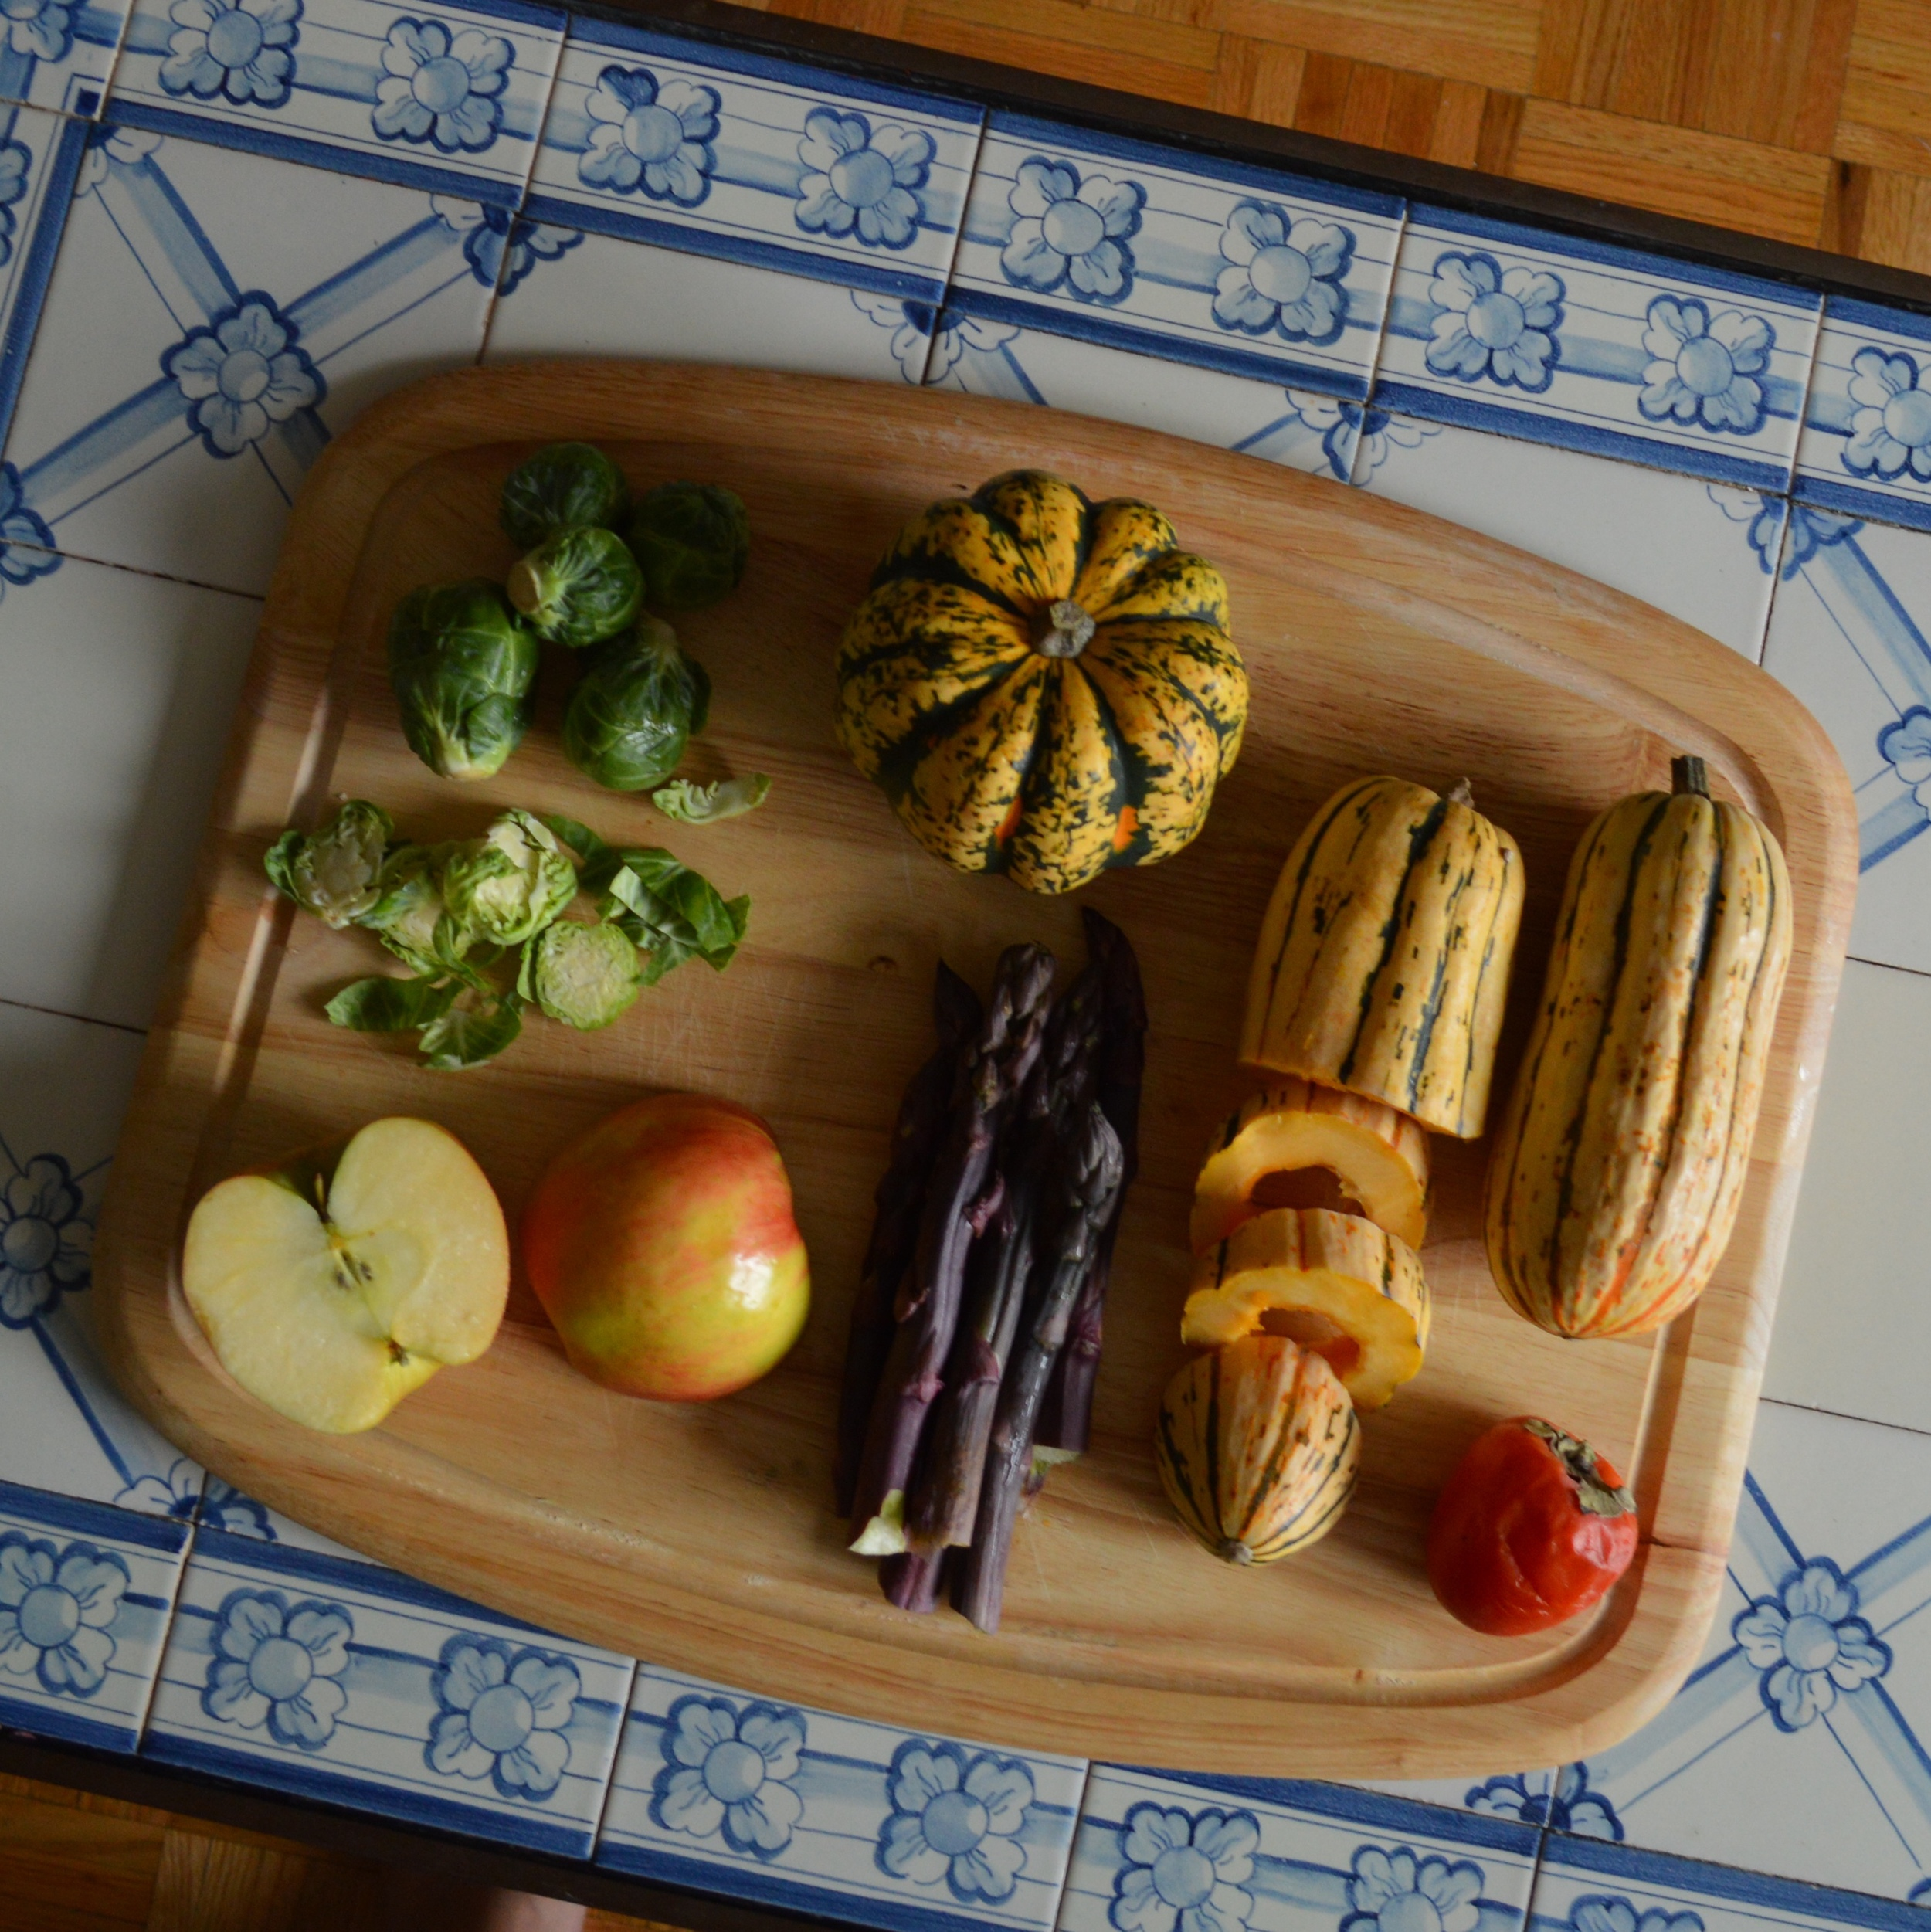 Brussels Sprouts, Honeycrisp Apple, Carnival Squash, Purple Asparagus, Delicata Squash, Persimmon